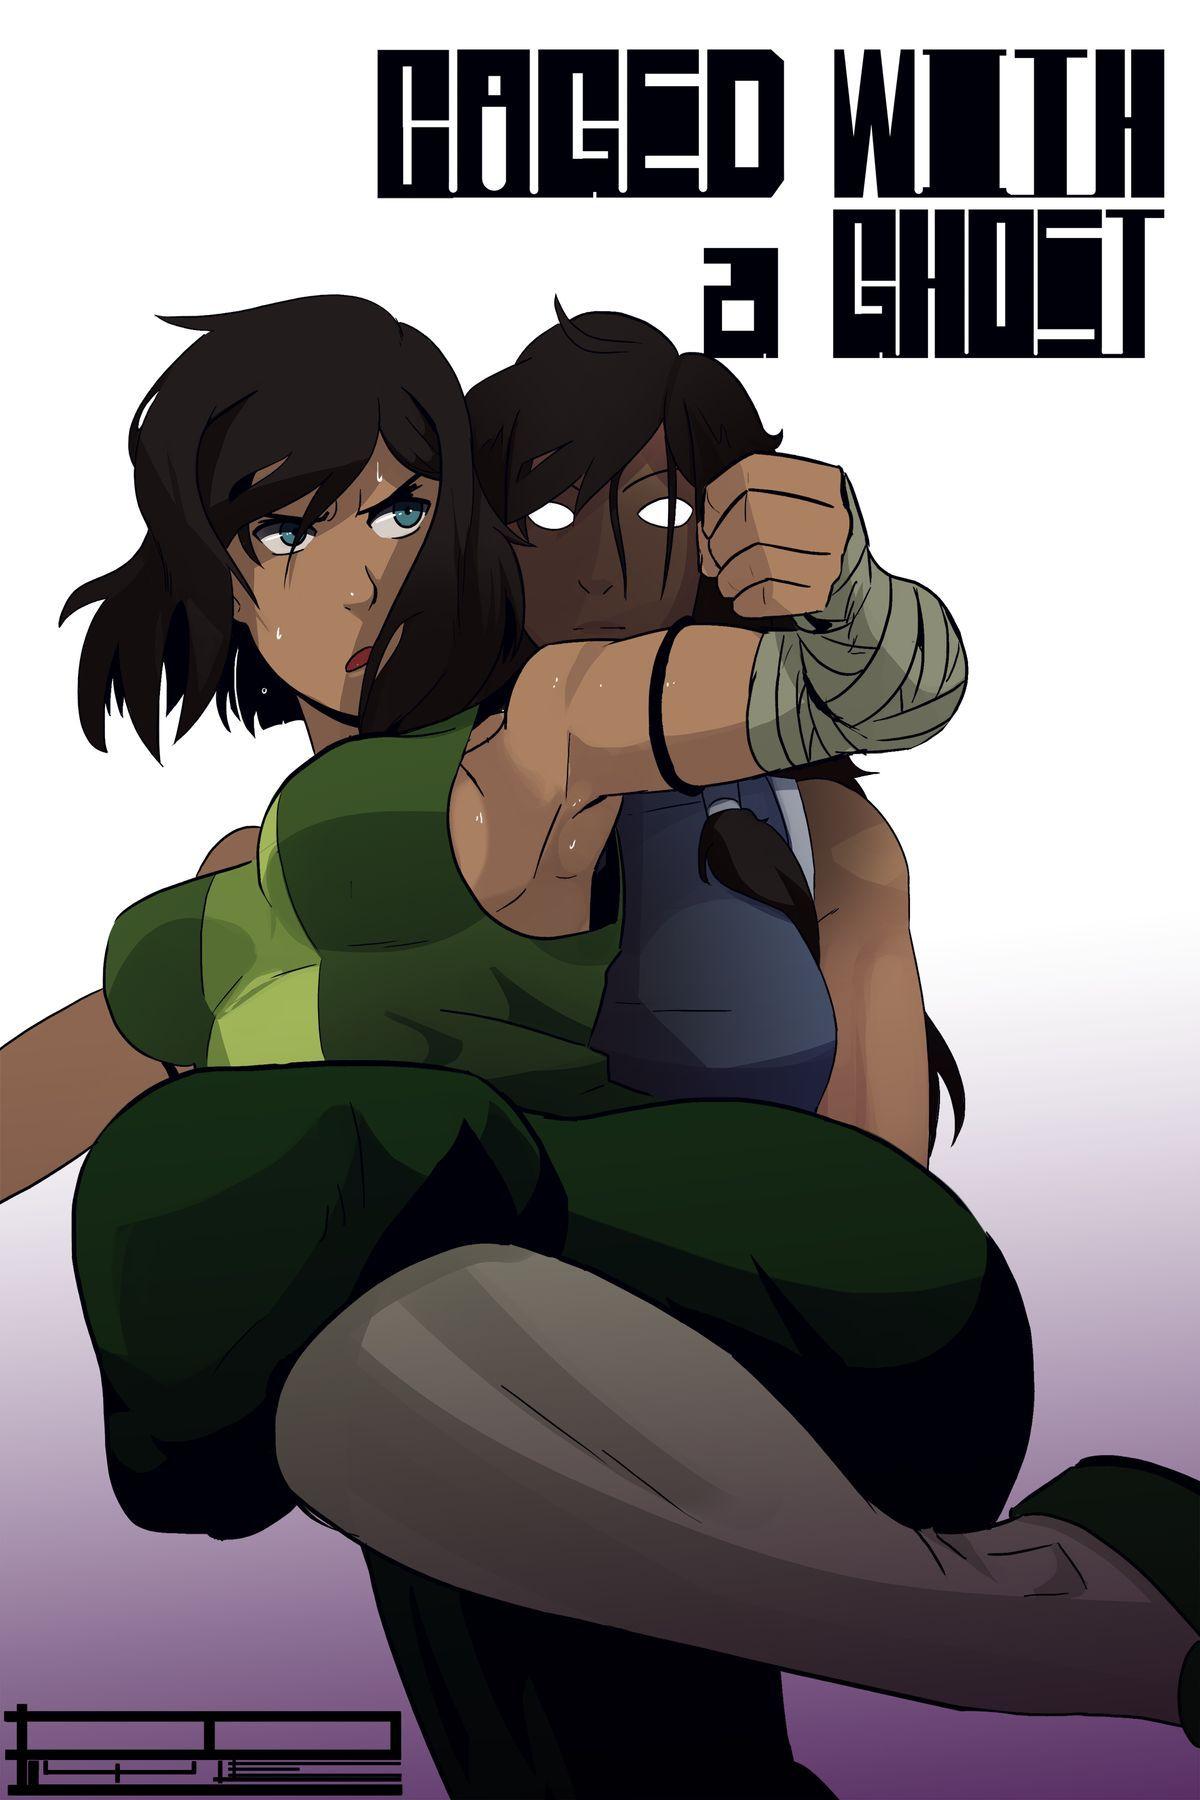 Avatar-pornô-Korra-dominada-em-combate-1